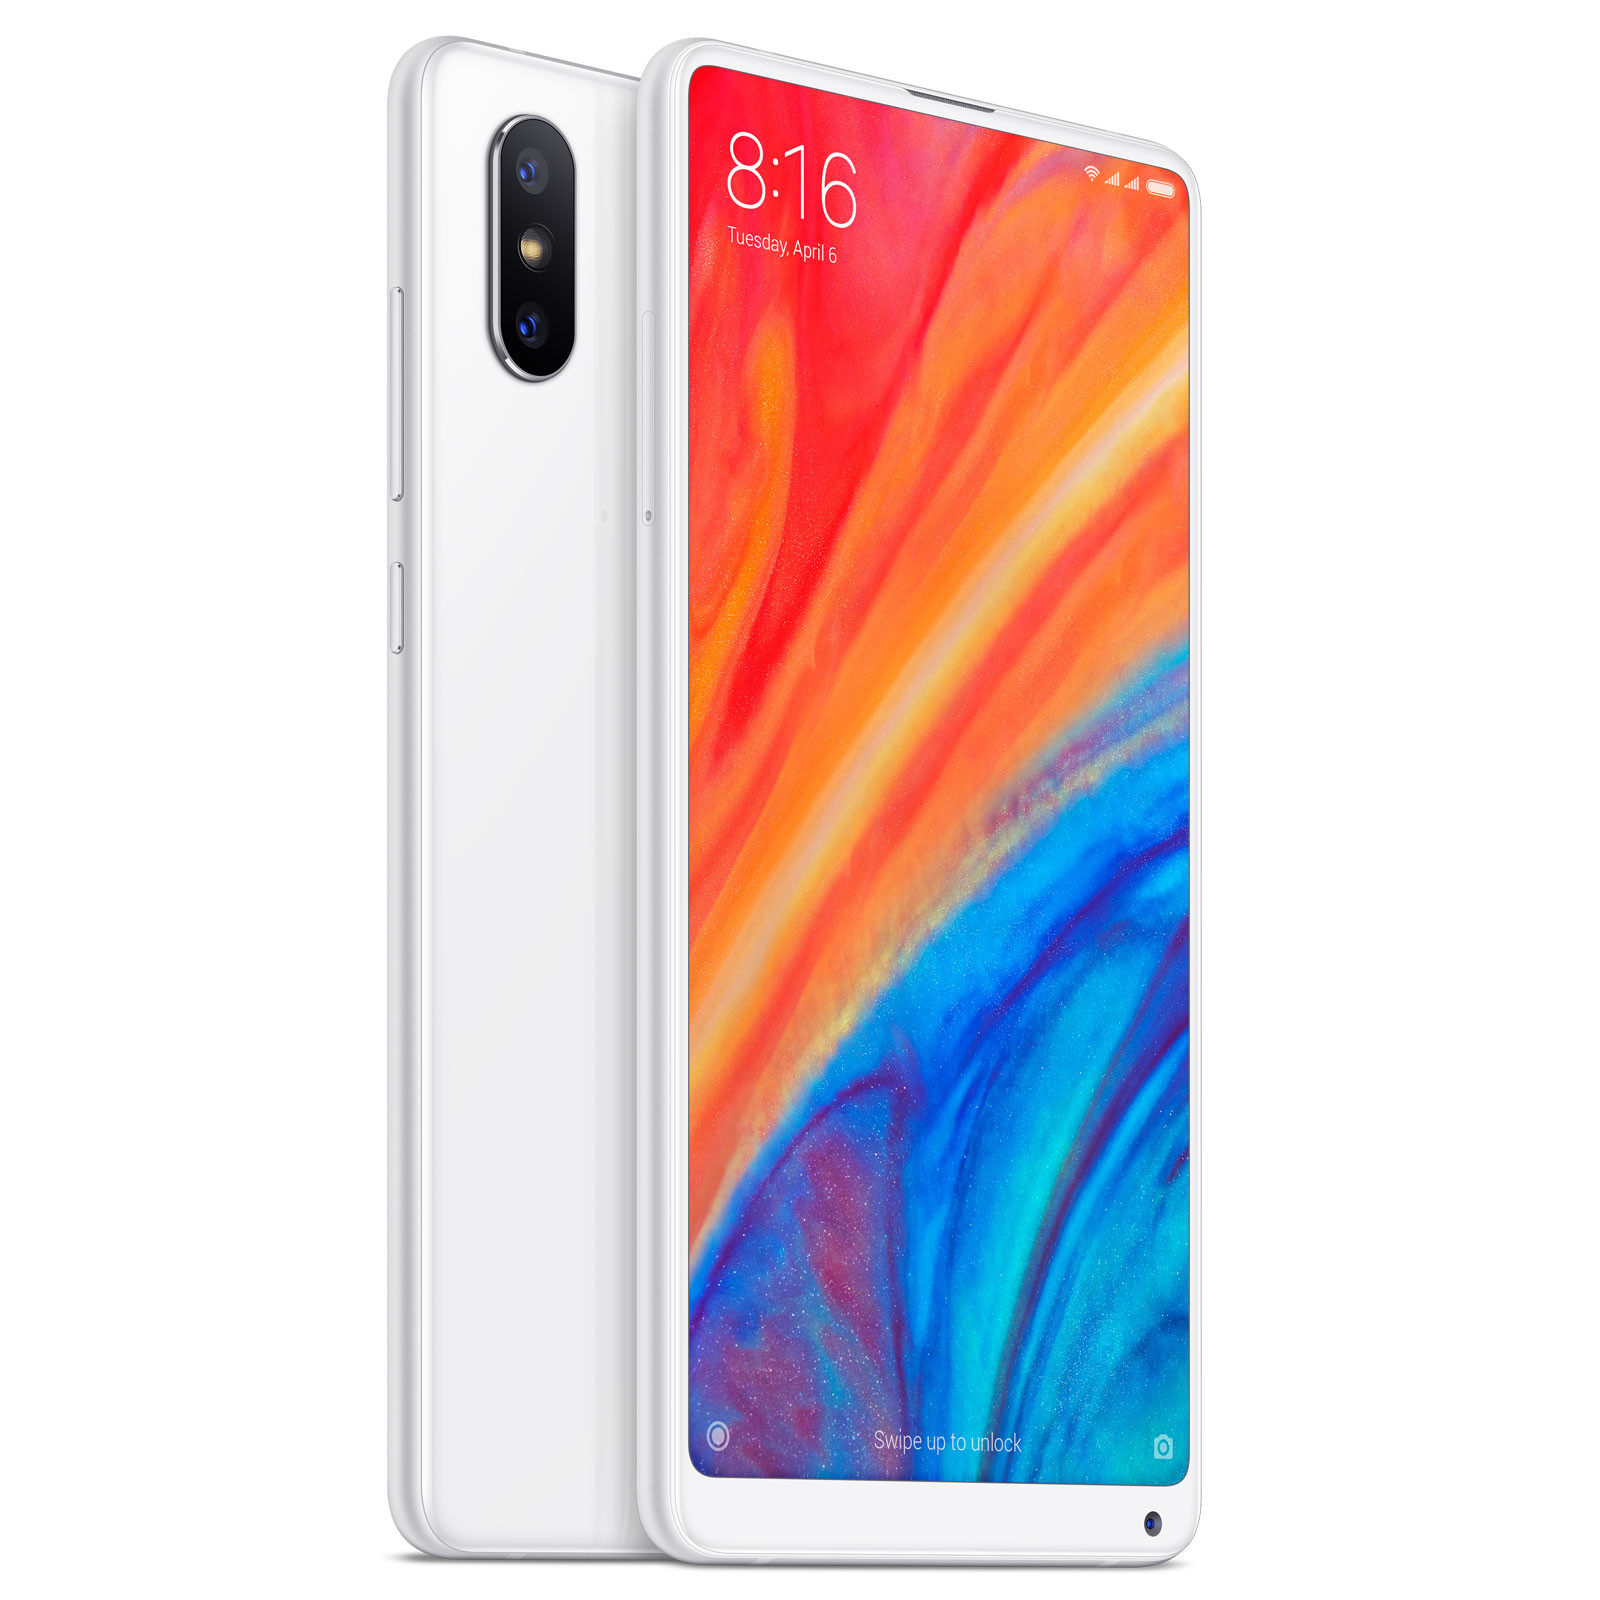 "⚡️ Soldes 2019 : Smartphone 5.99"" Xiaomi Mi Mix 2S - 64 Go à 299€ (avec ODR de 50€)"